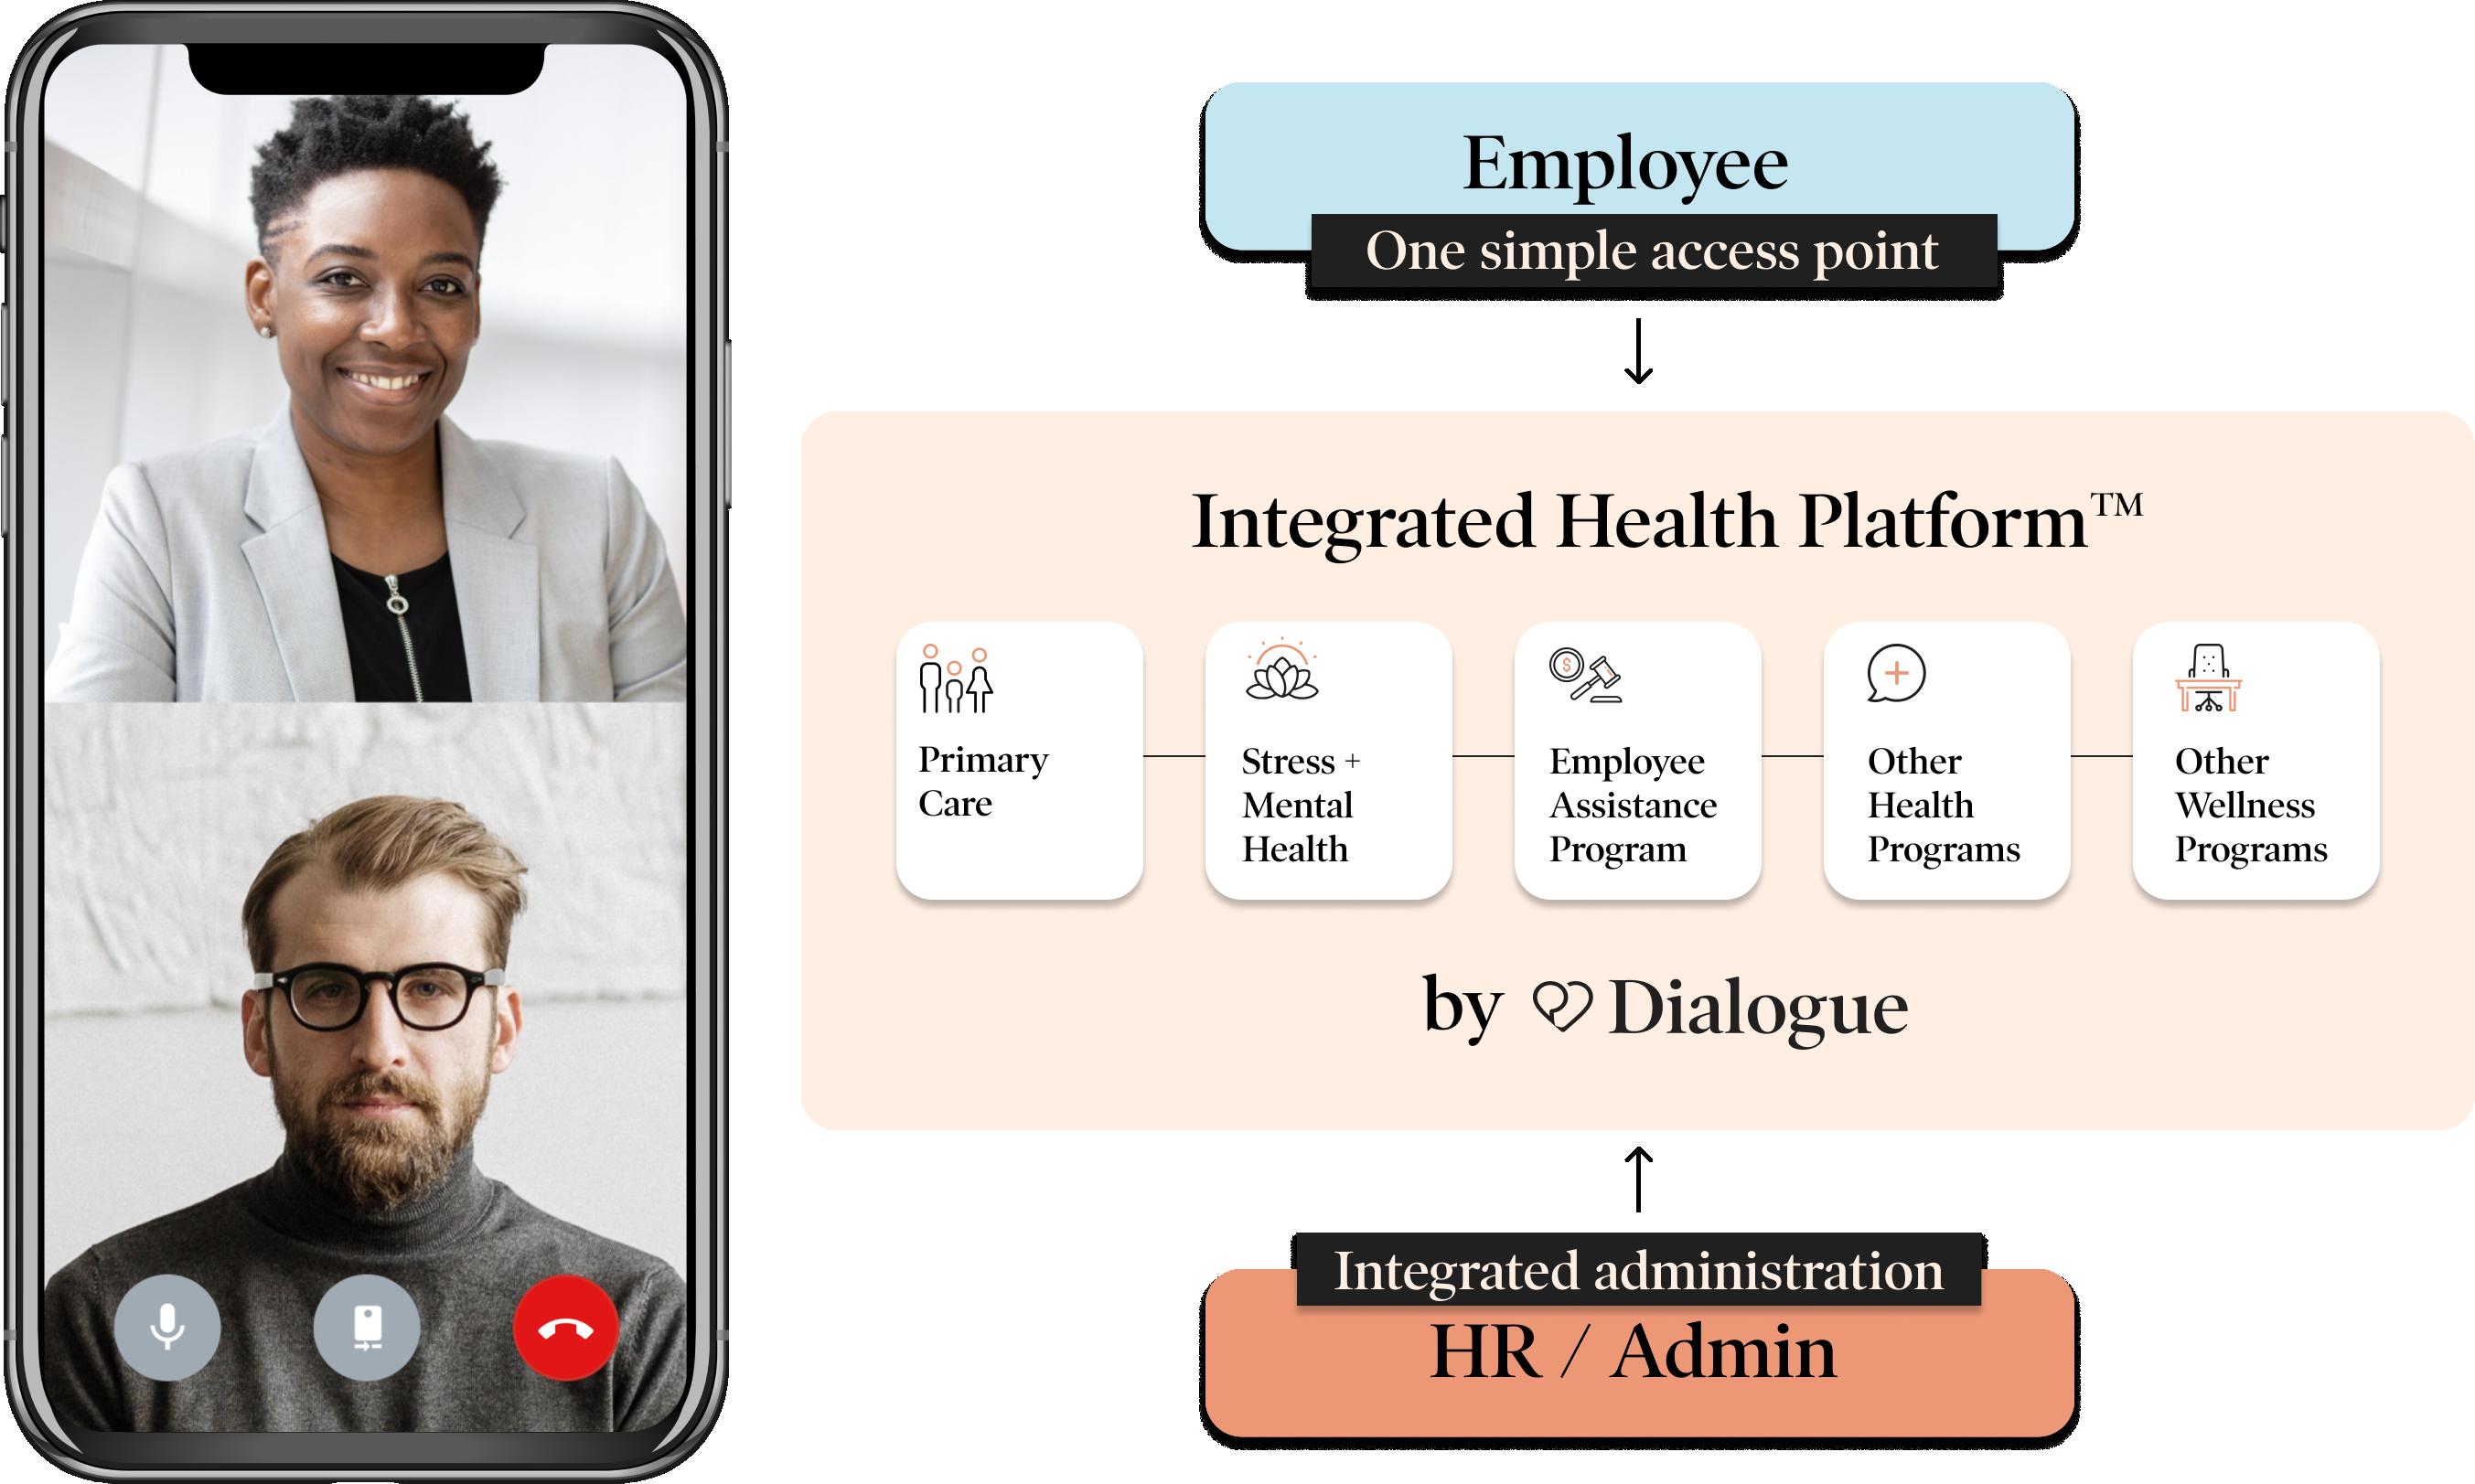 Integrated Health Platform